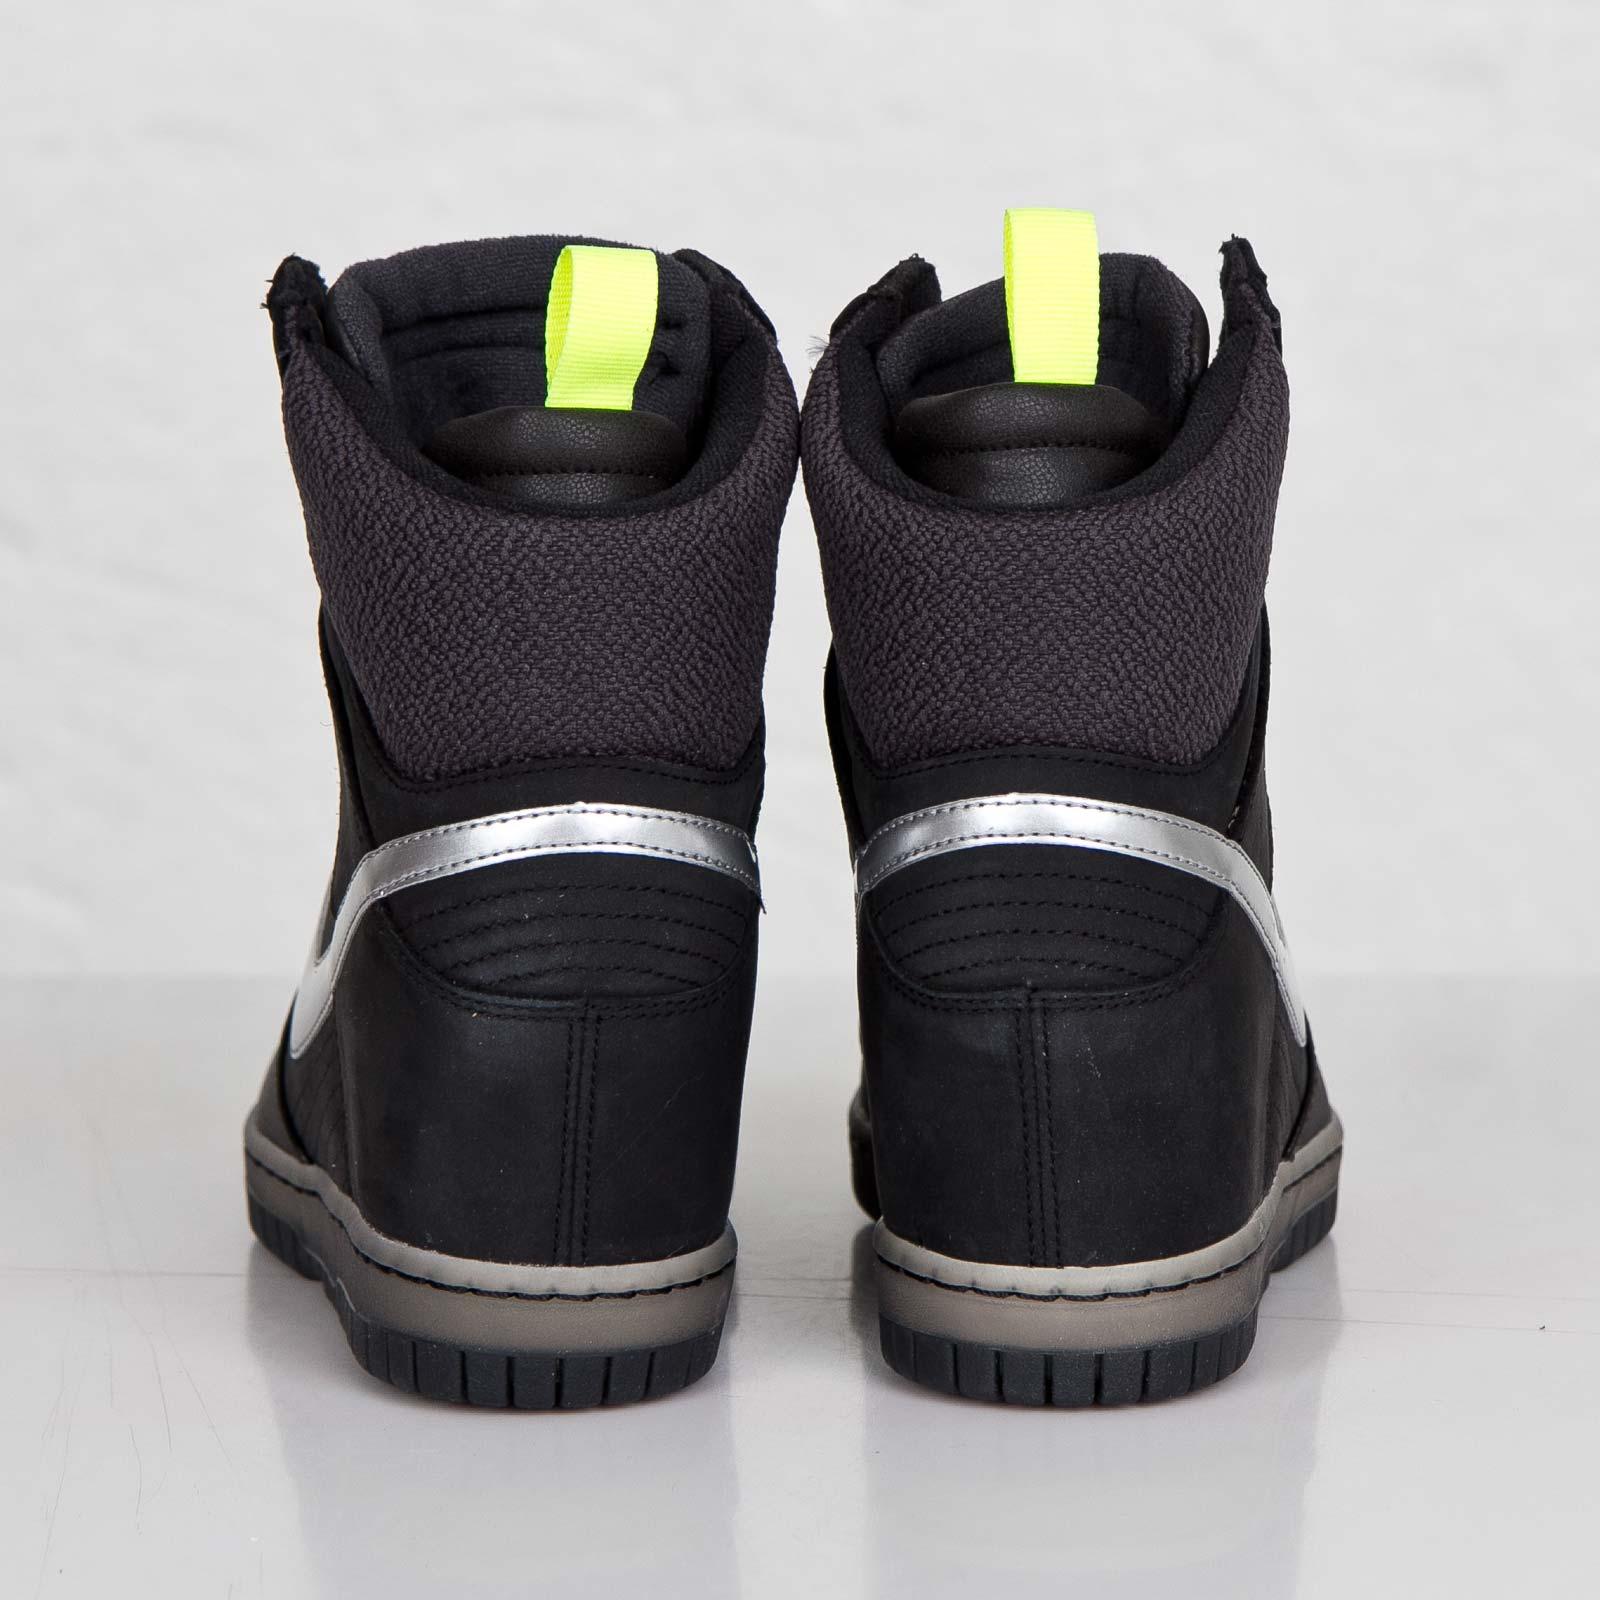 Nike WMNS Dunk Sky Hi Sneakerboot 2.0